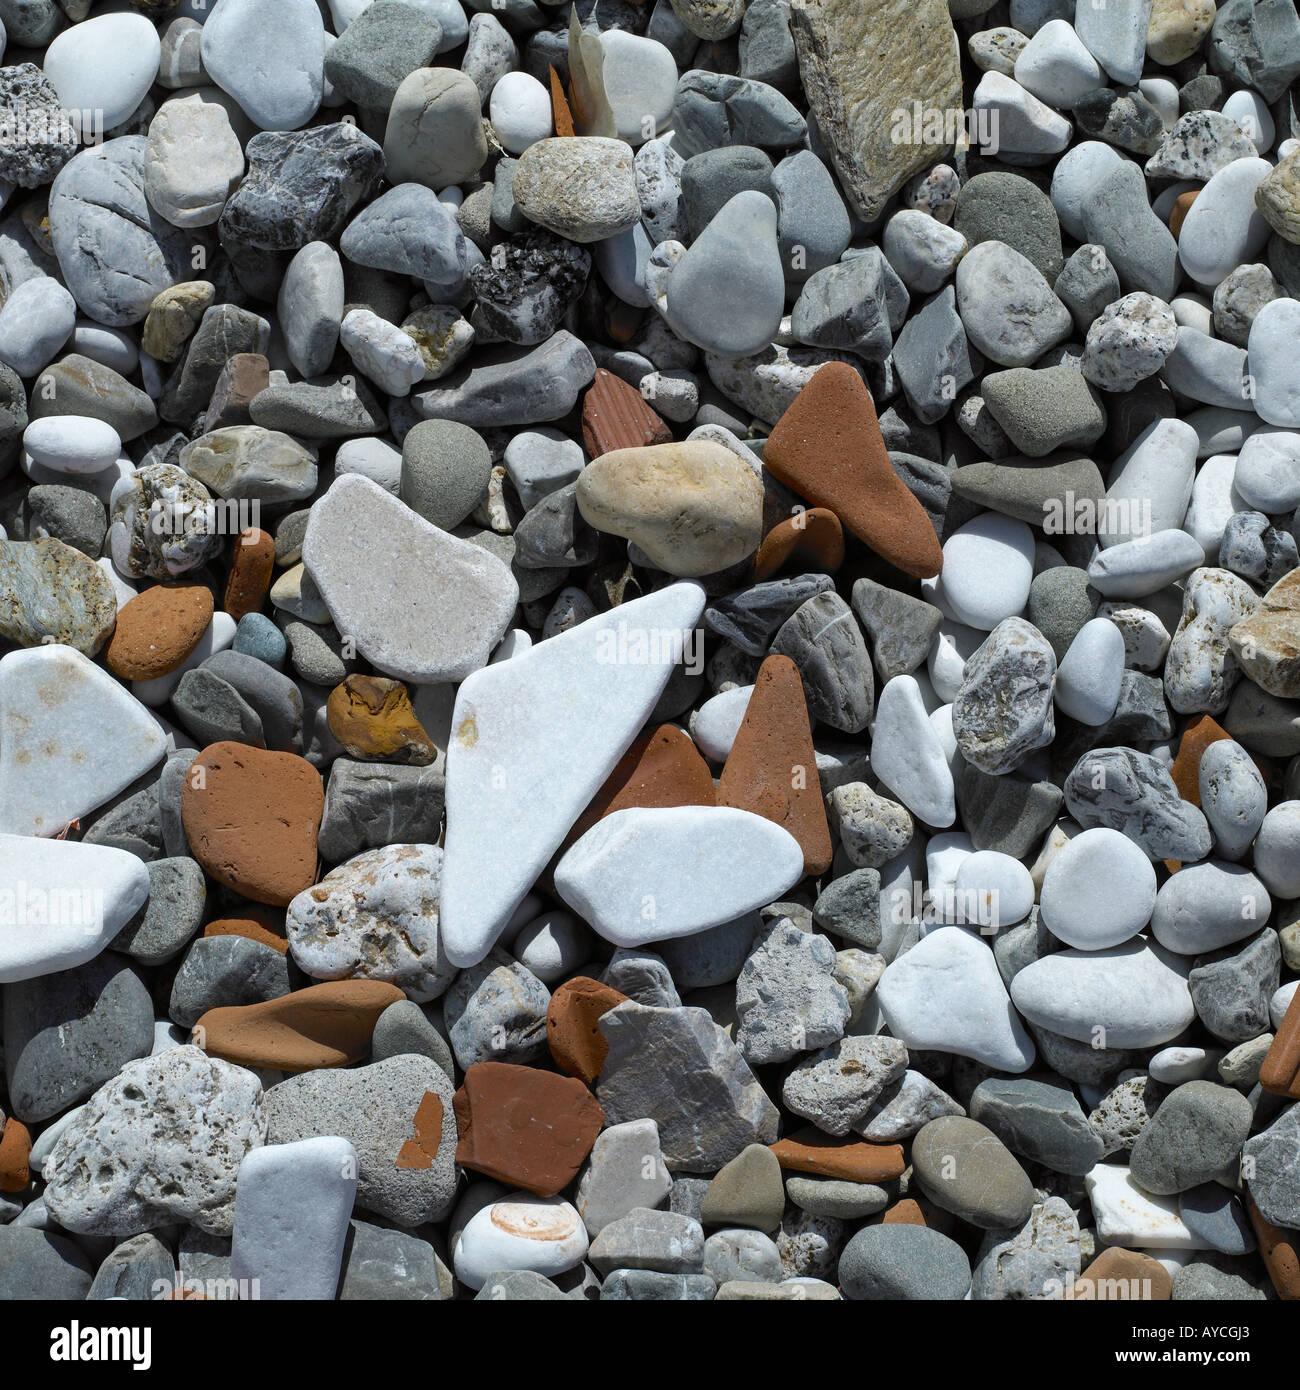 Pebble beach - high end Hasselblad digital capture 48mb - Stock Image